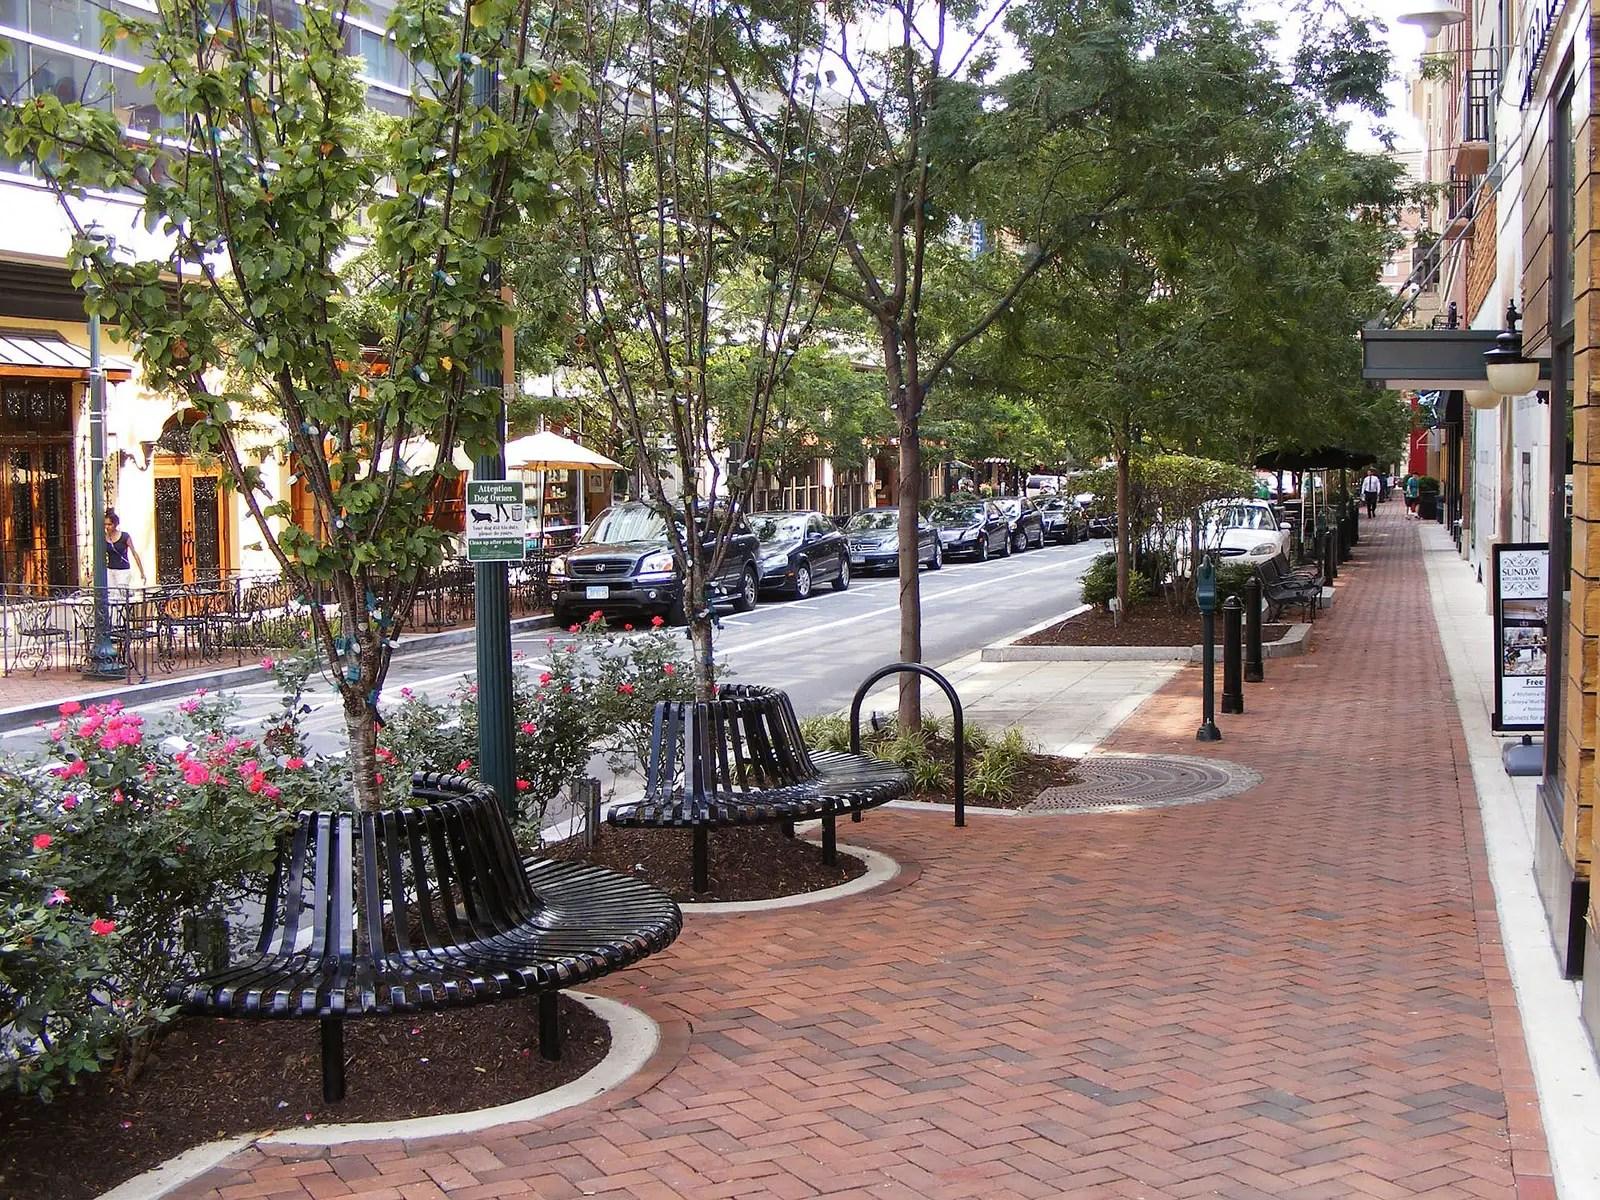 19. Rockville, Maryland